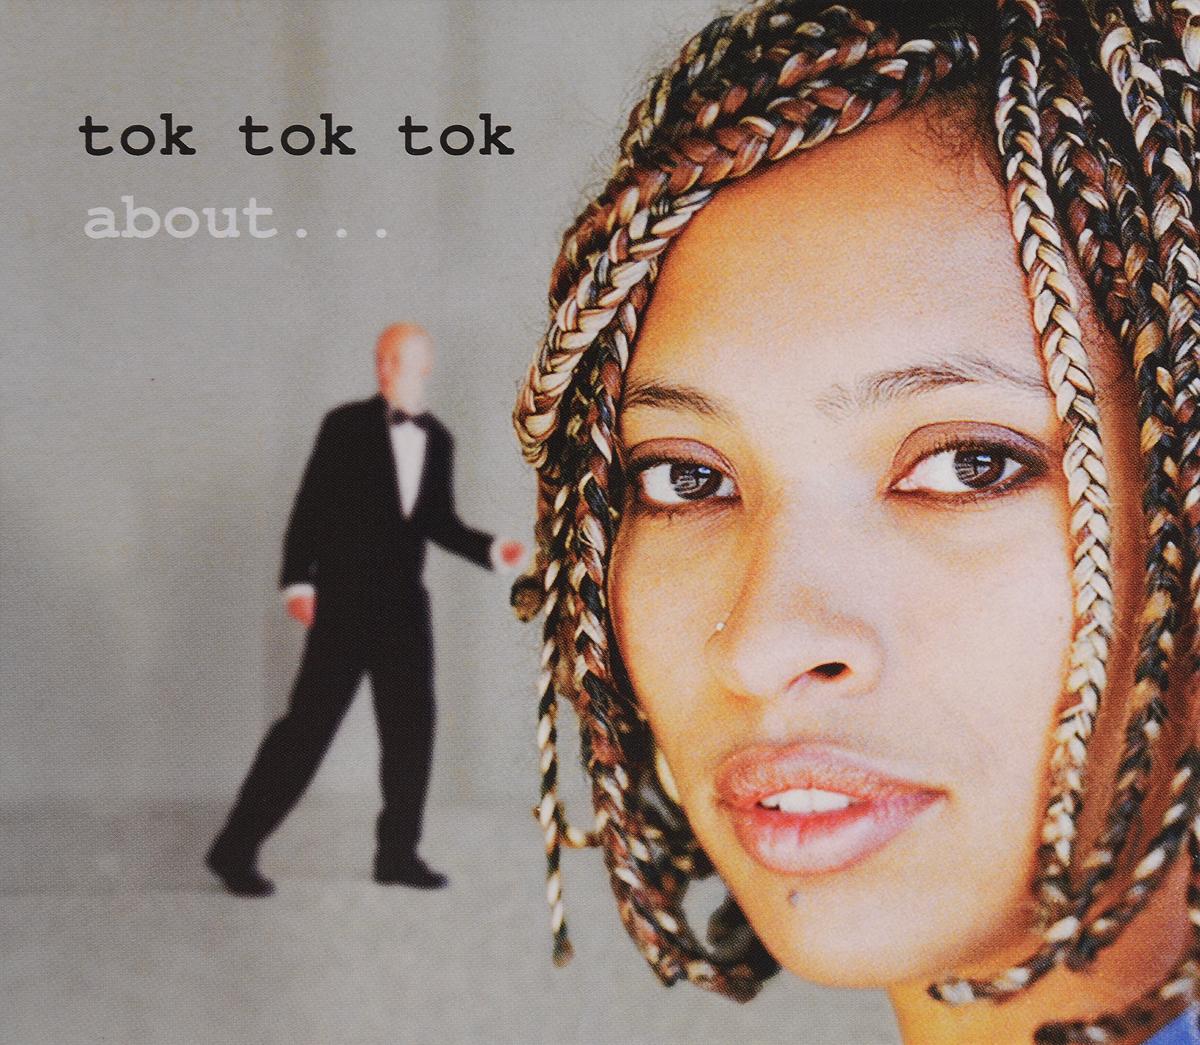 Tok Tok Tok Tok Tok Tok. About... tok tok tok tok tok tok gershwin with strings page 3 page 10 page 5 page 2